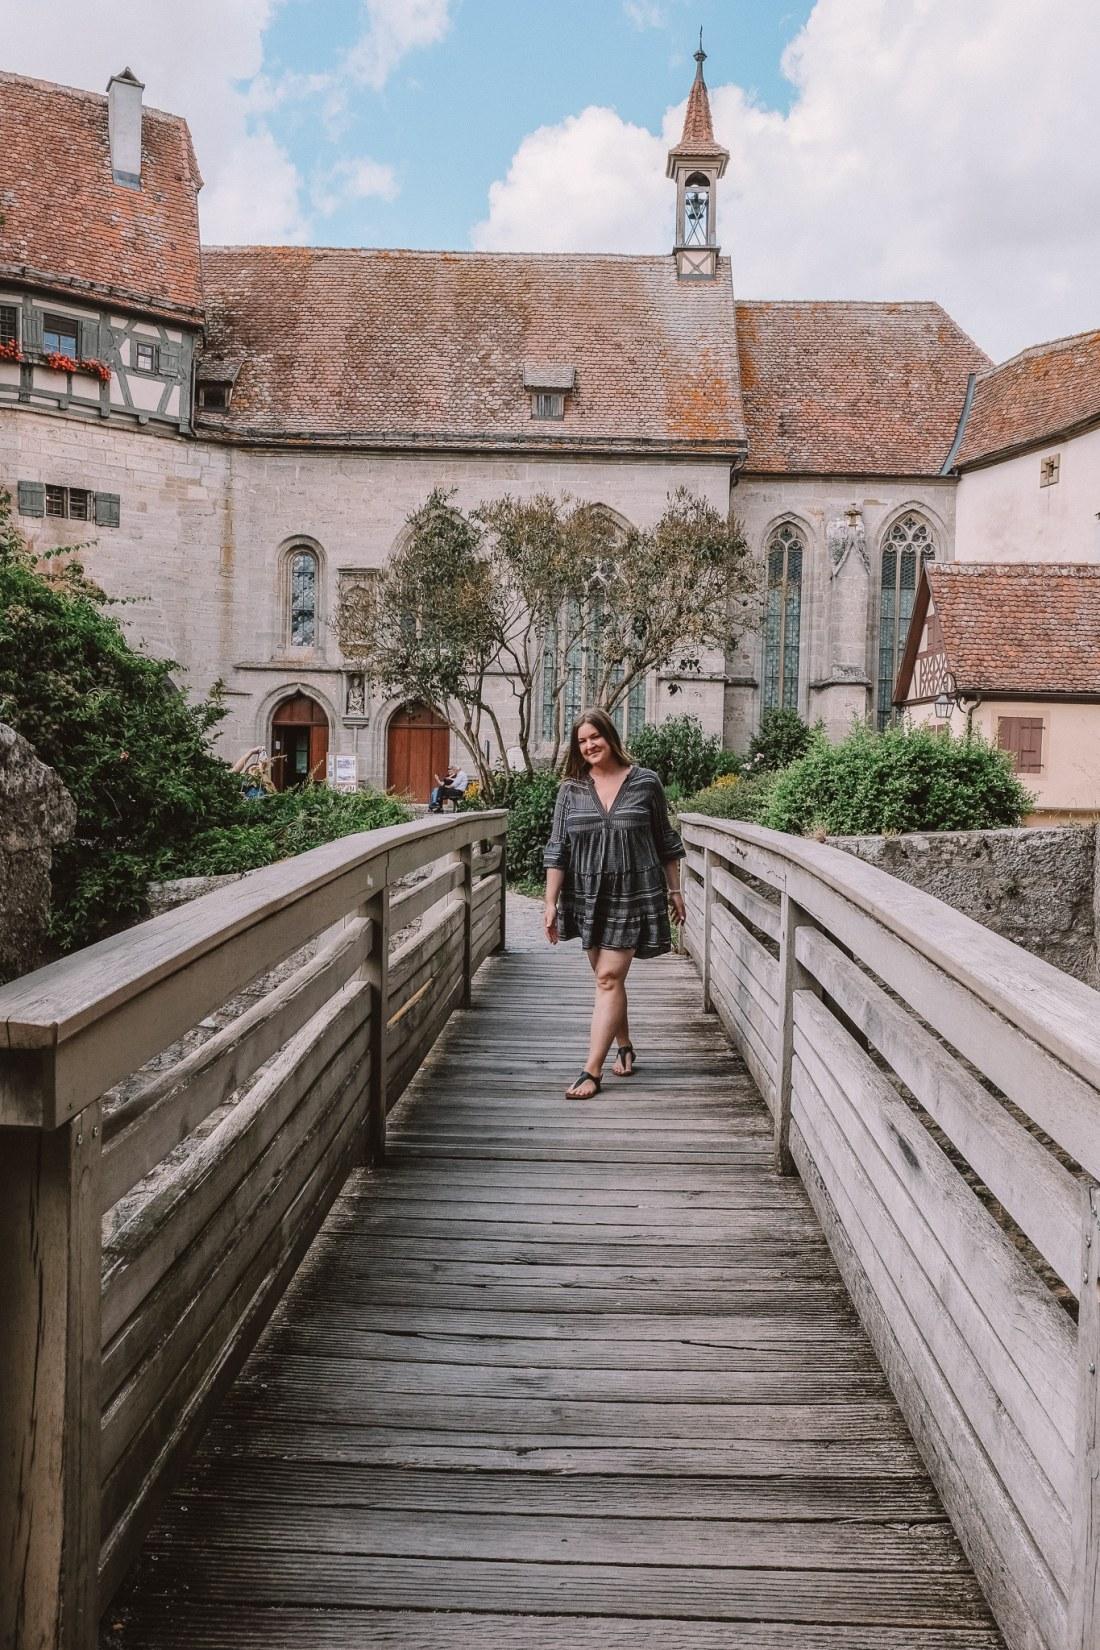 Best Hotels in Rothenburg ob der Tauber